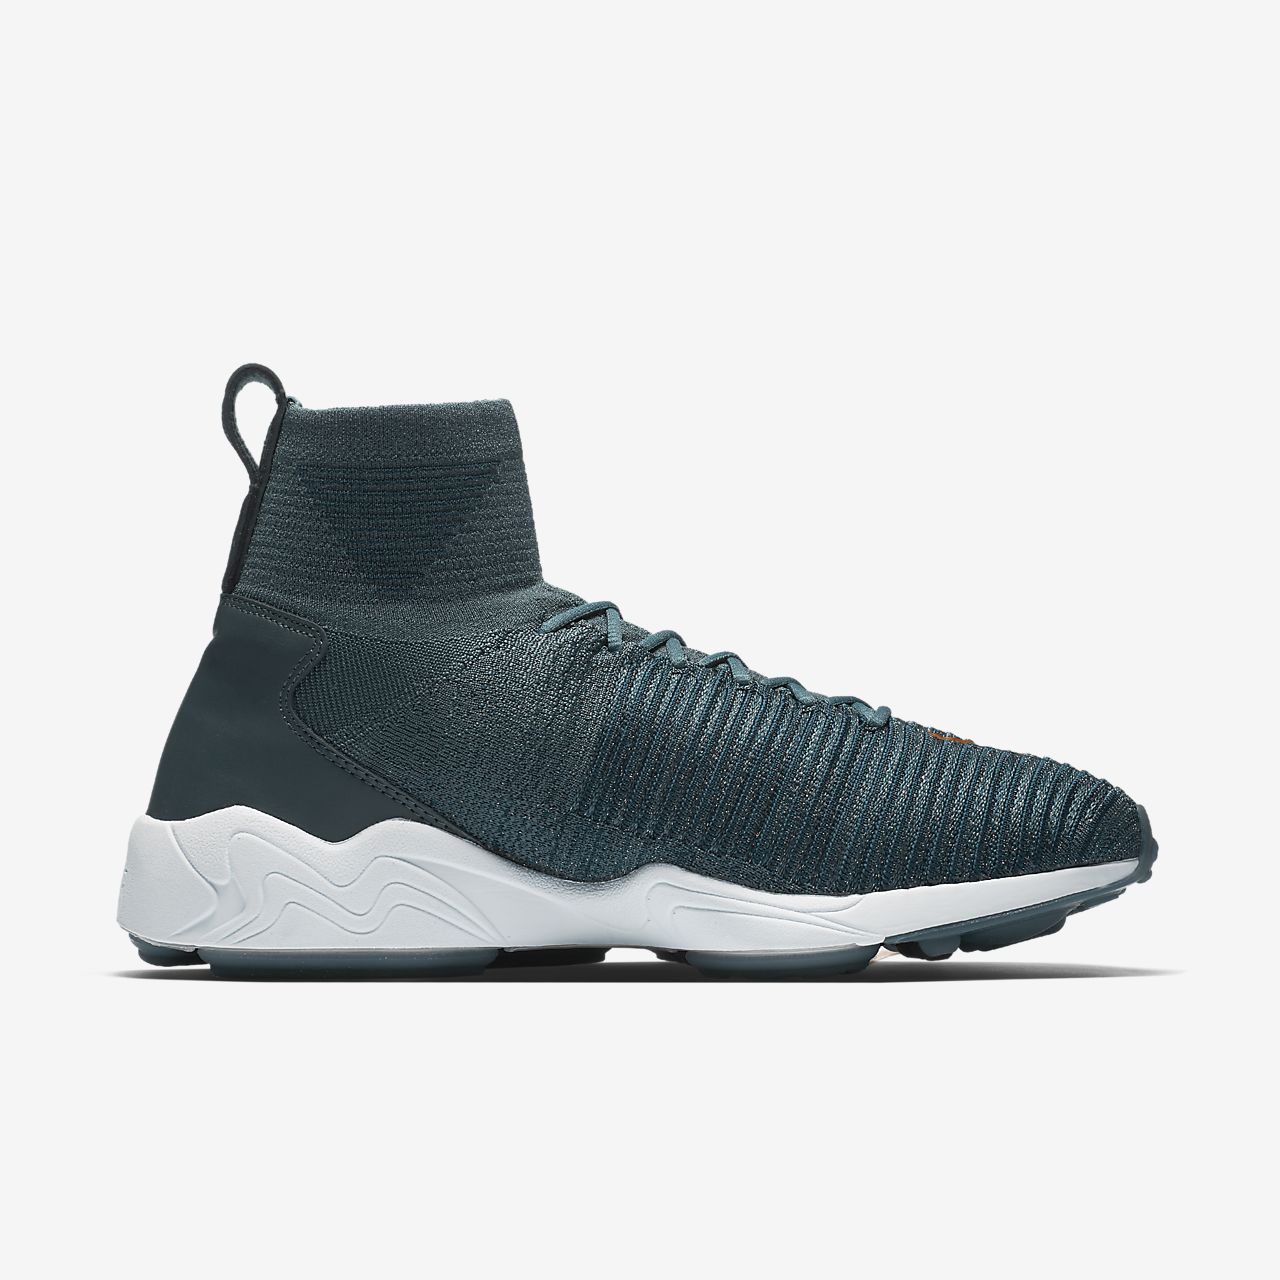 Zapatos azules Nike Magista para hombre kjljvQs4pw